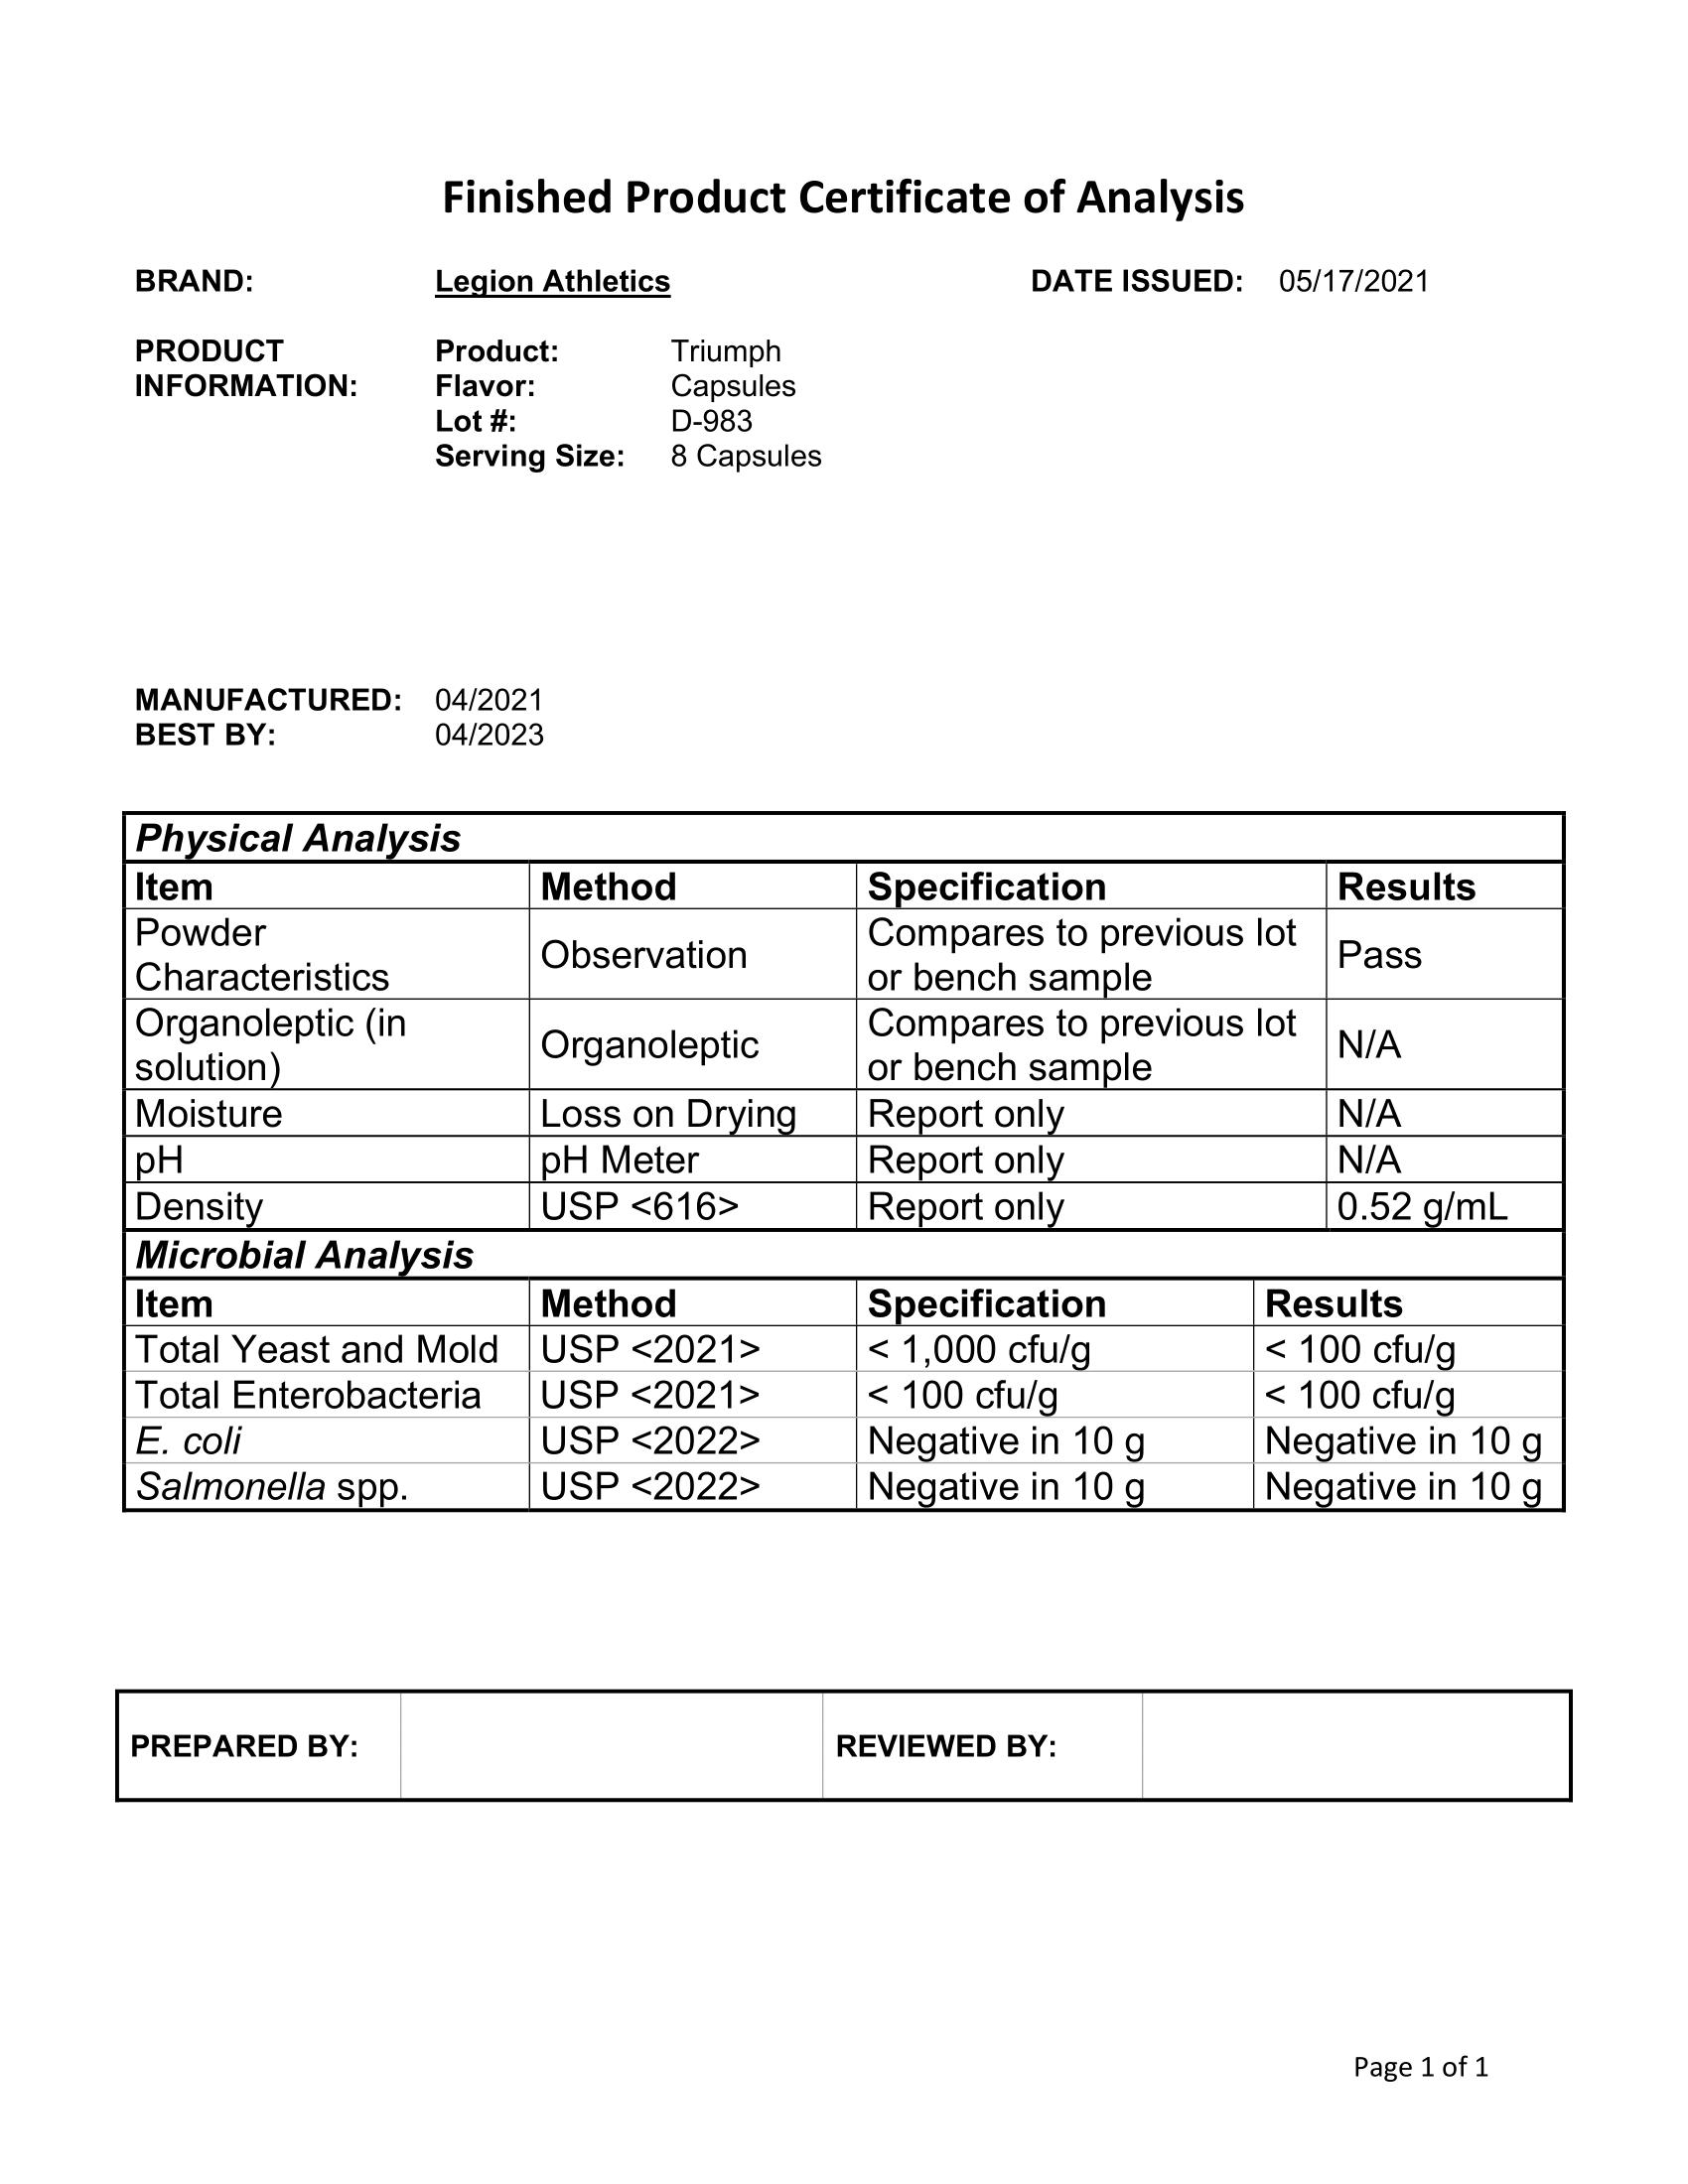 Triumph Men Lab Test Certificate